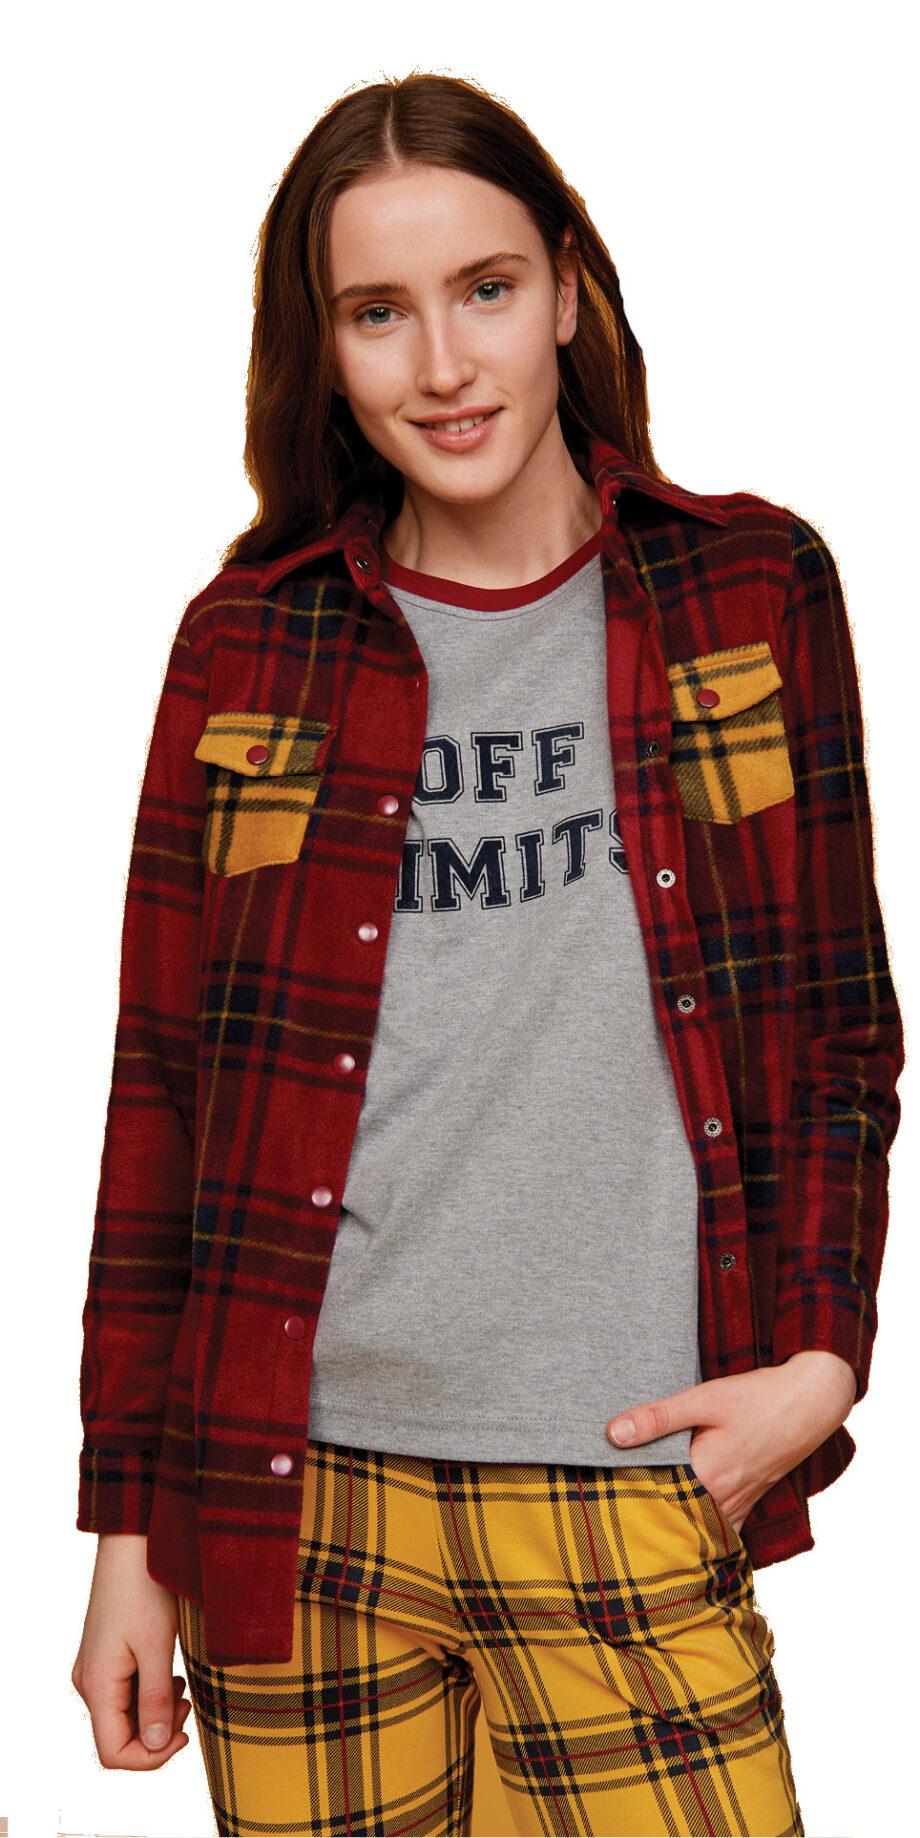 GE2125-woman-noidinotte-Shirt.jpg